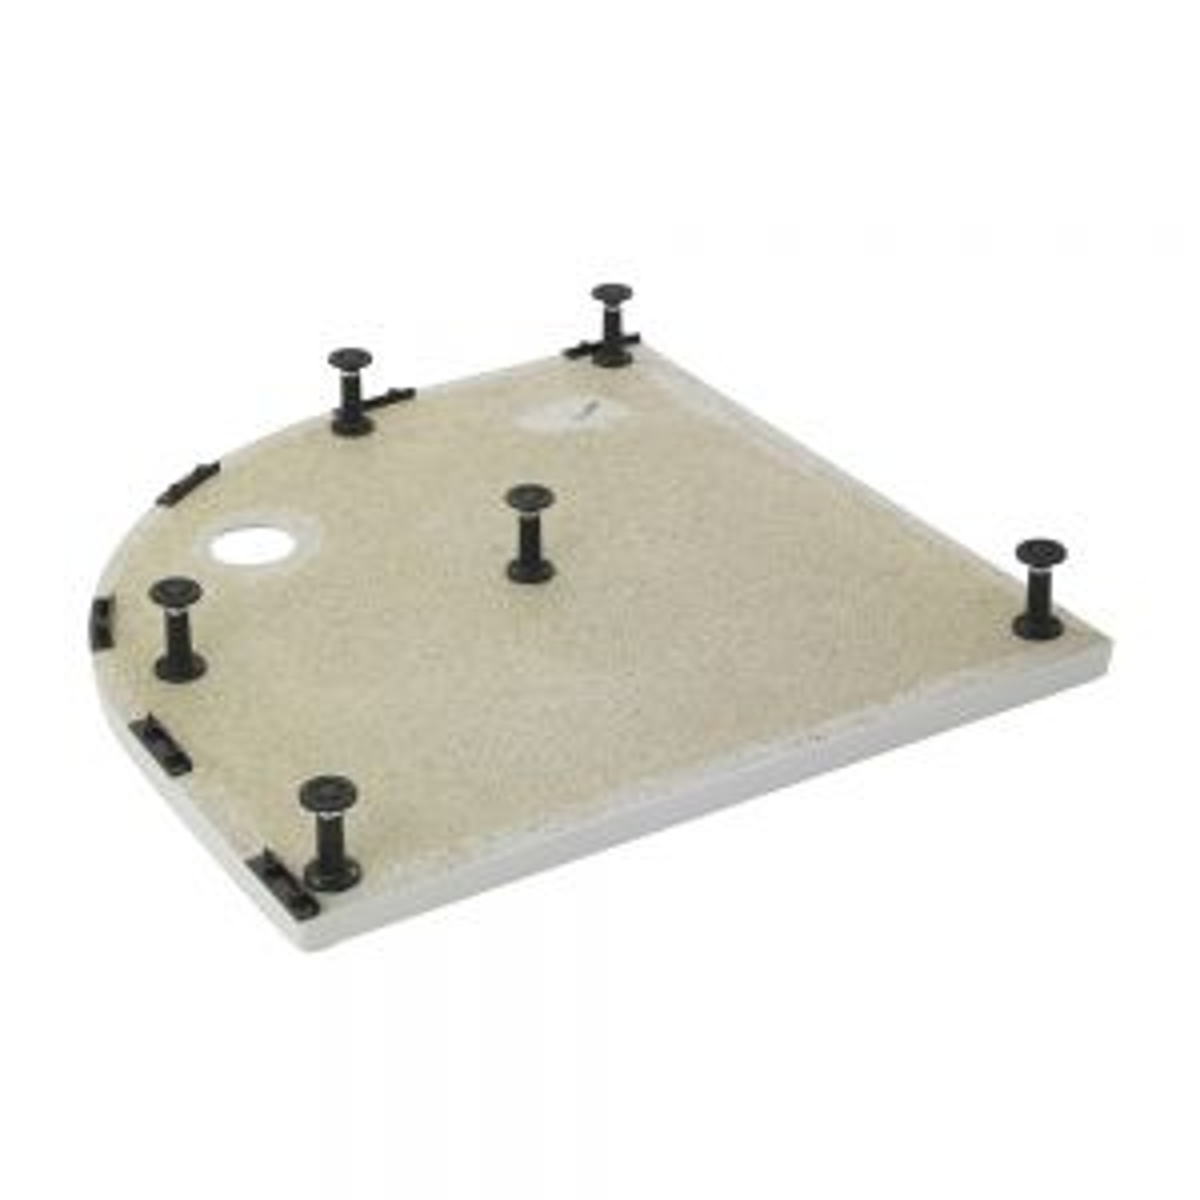 Premier Pearlstone D-Shaped Shower Tray Riser Kit Legs